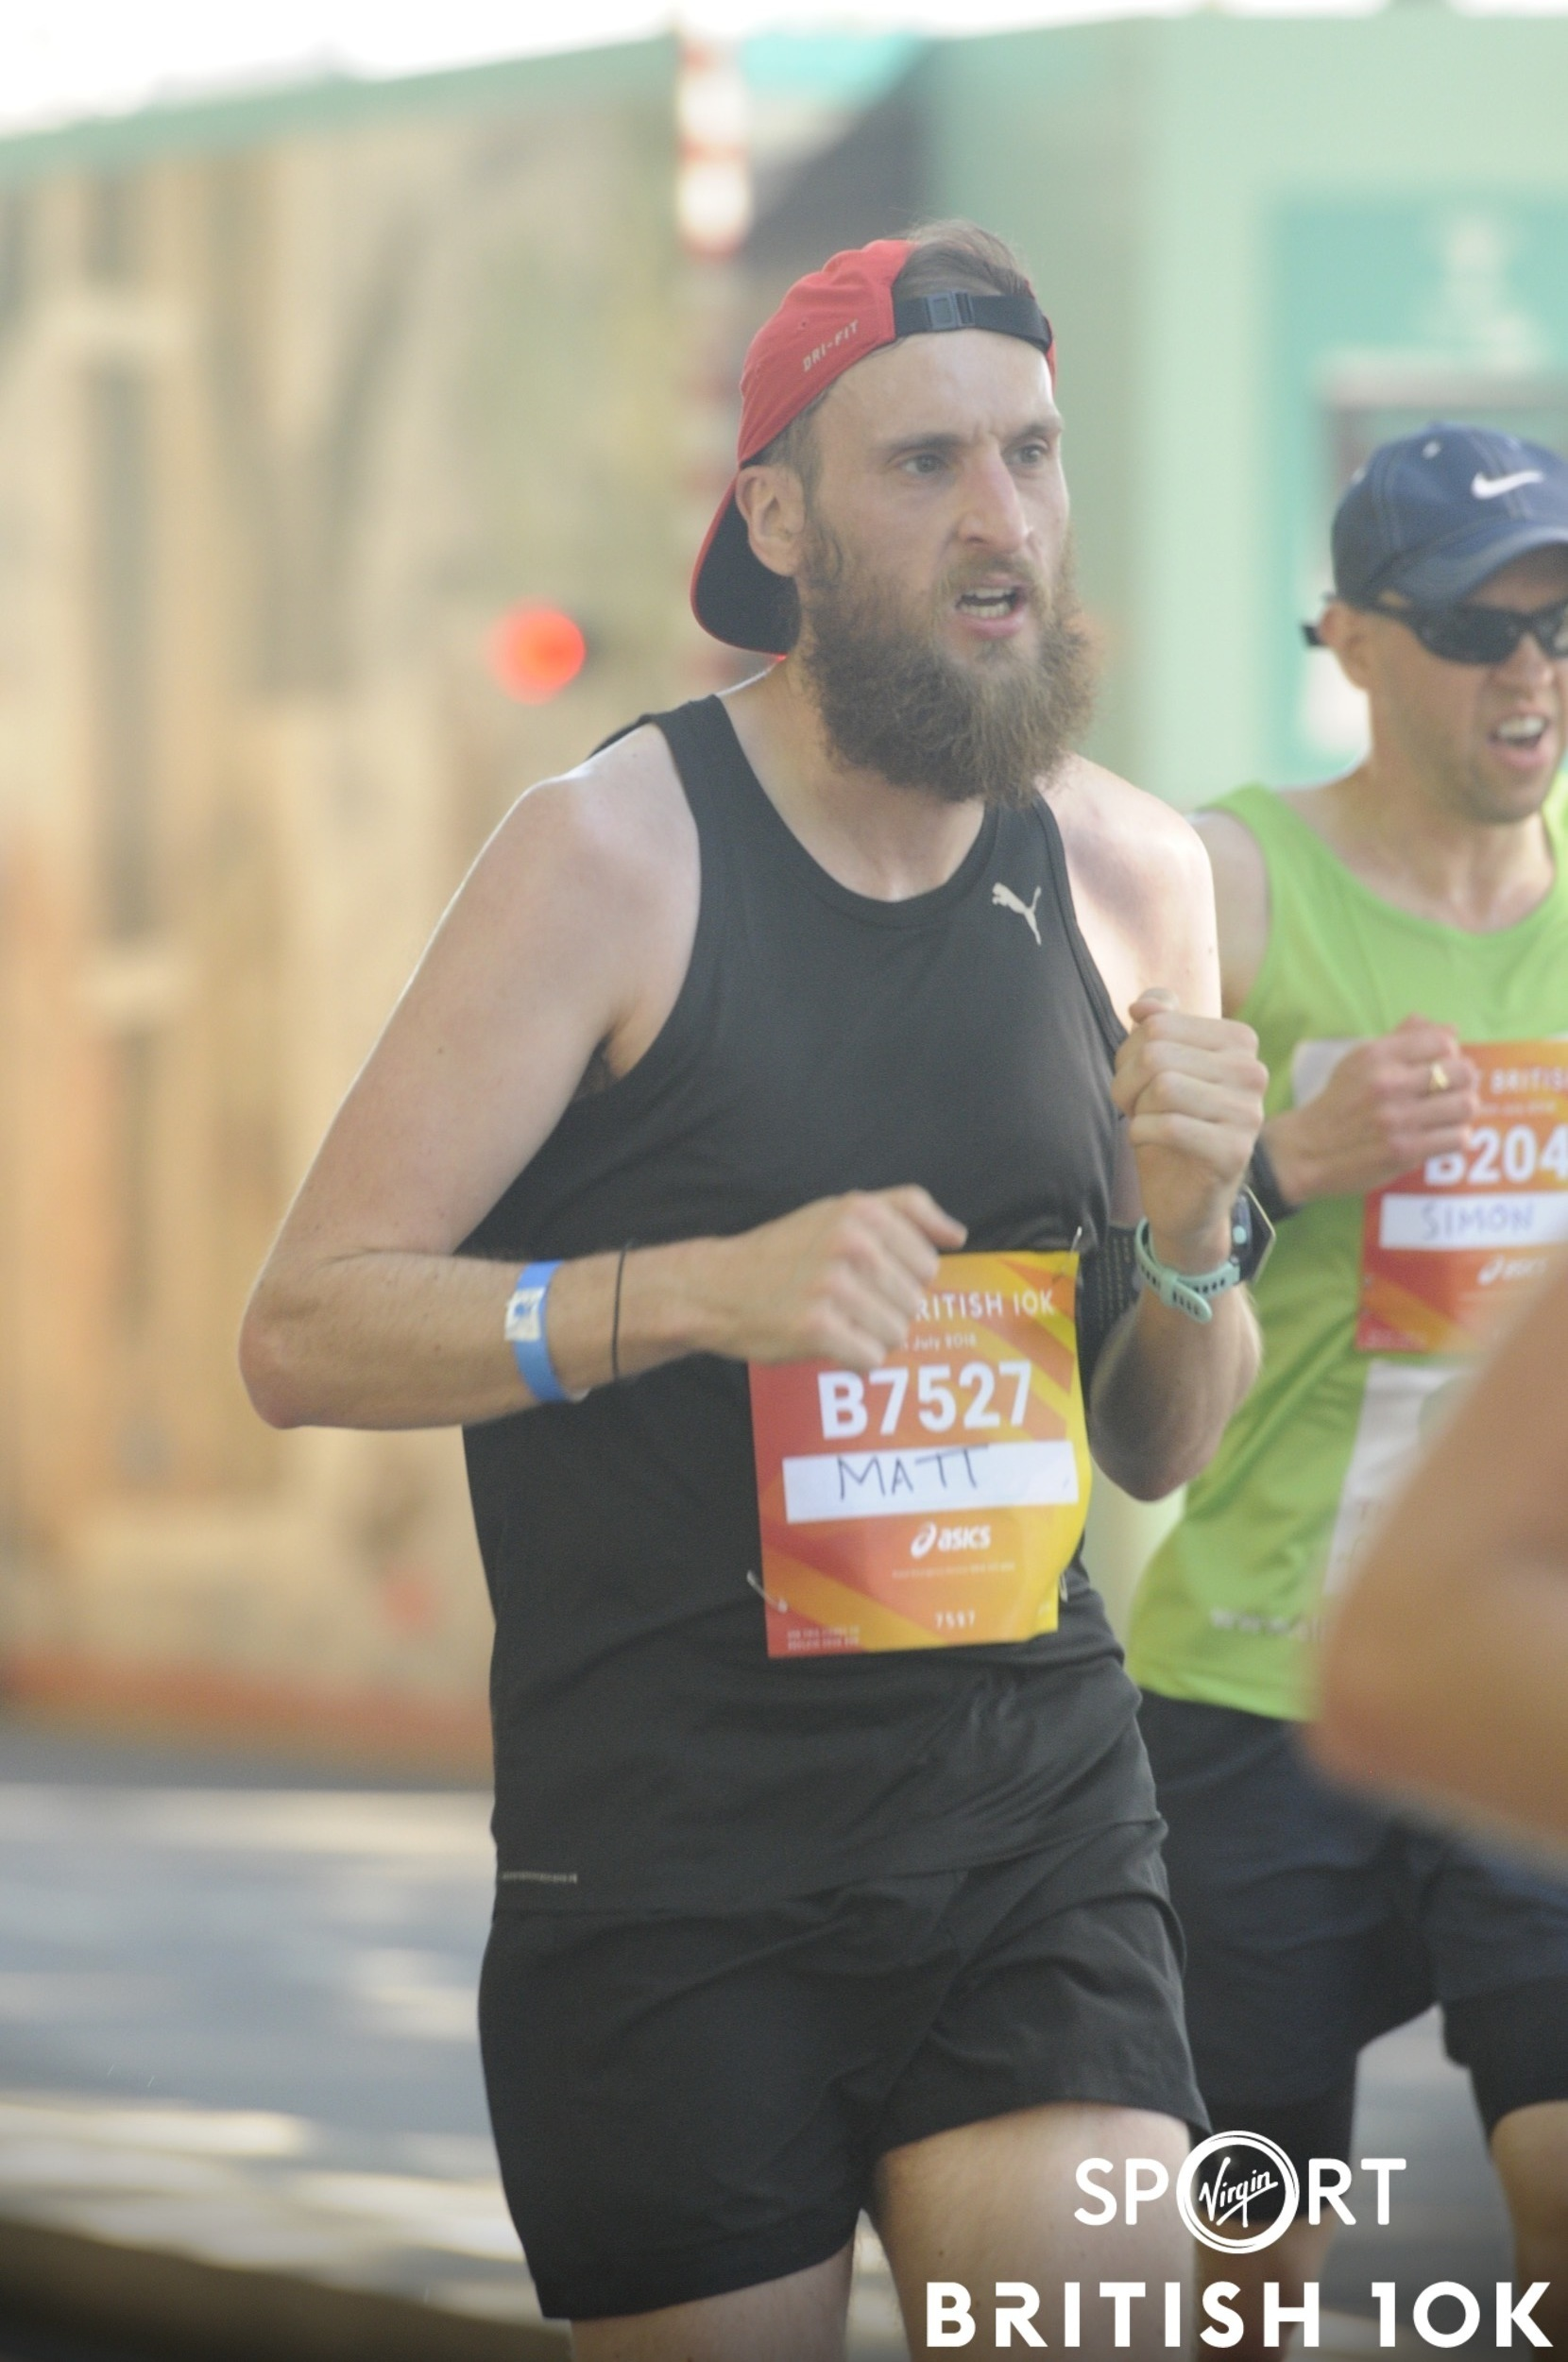 race_4021_photo_62591661.jpg